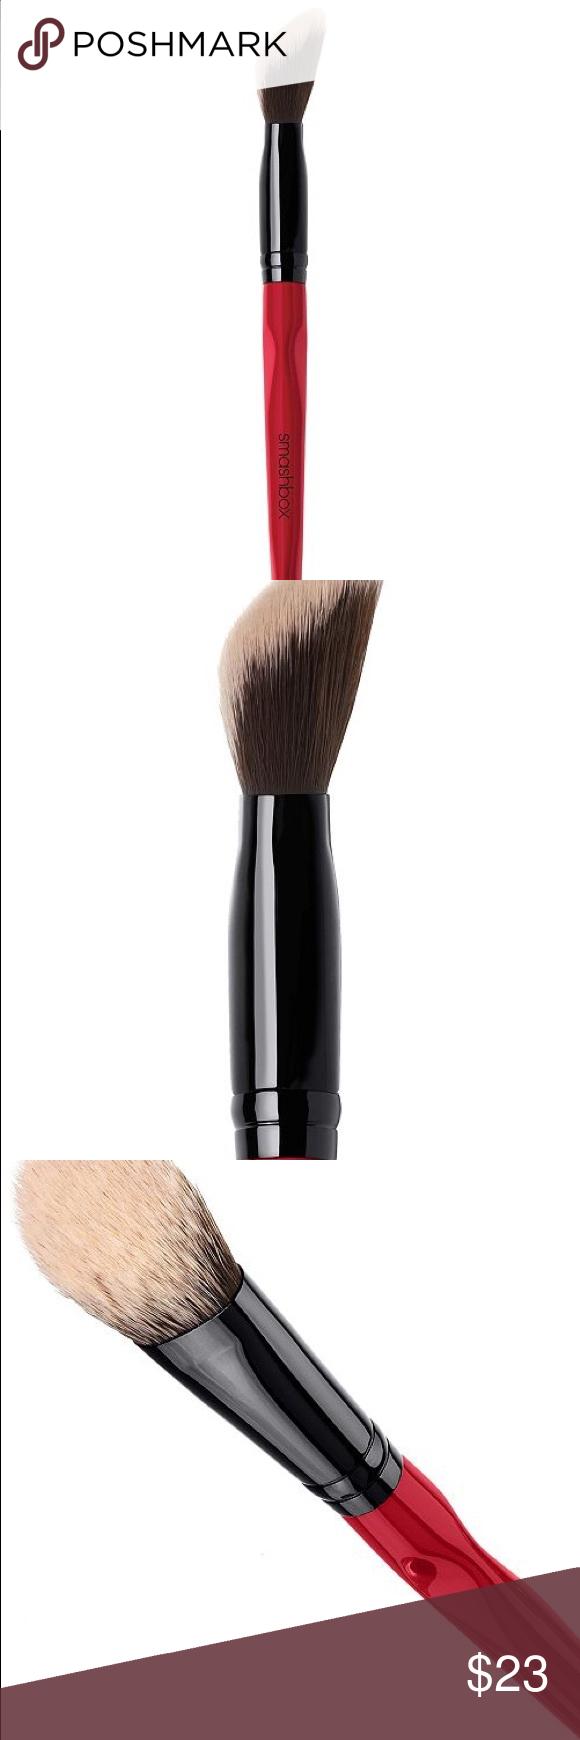 NEW Smashbox Angled Powder/Contour Brush Look more